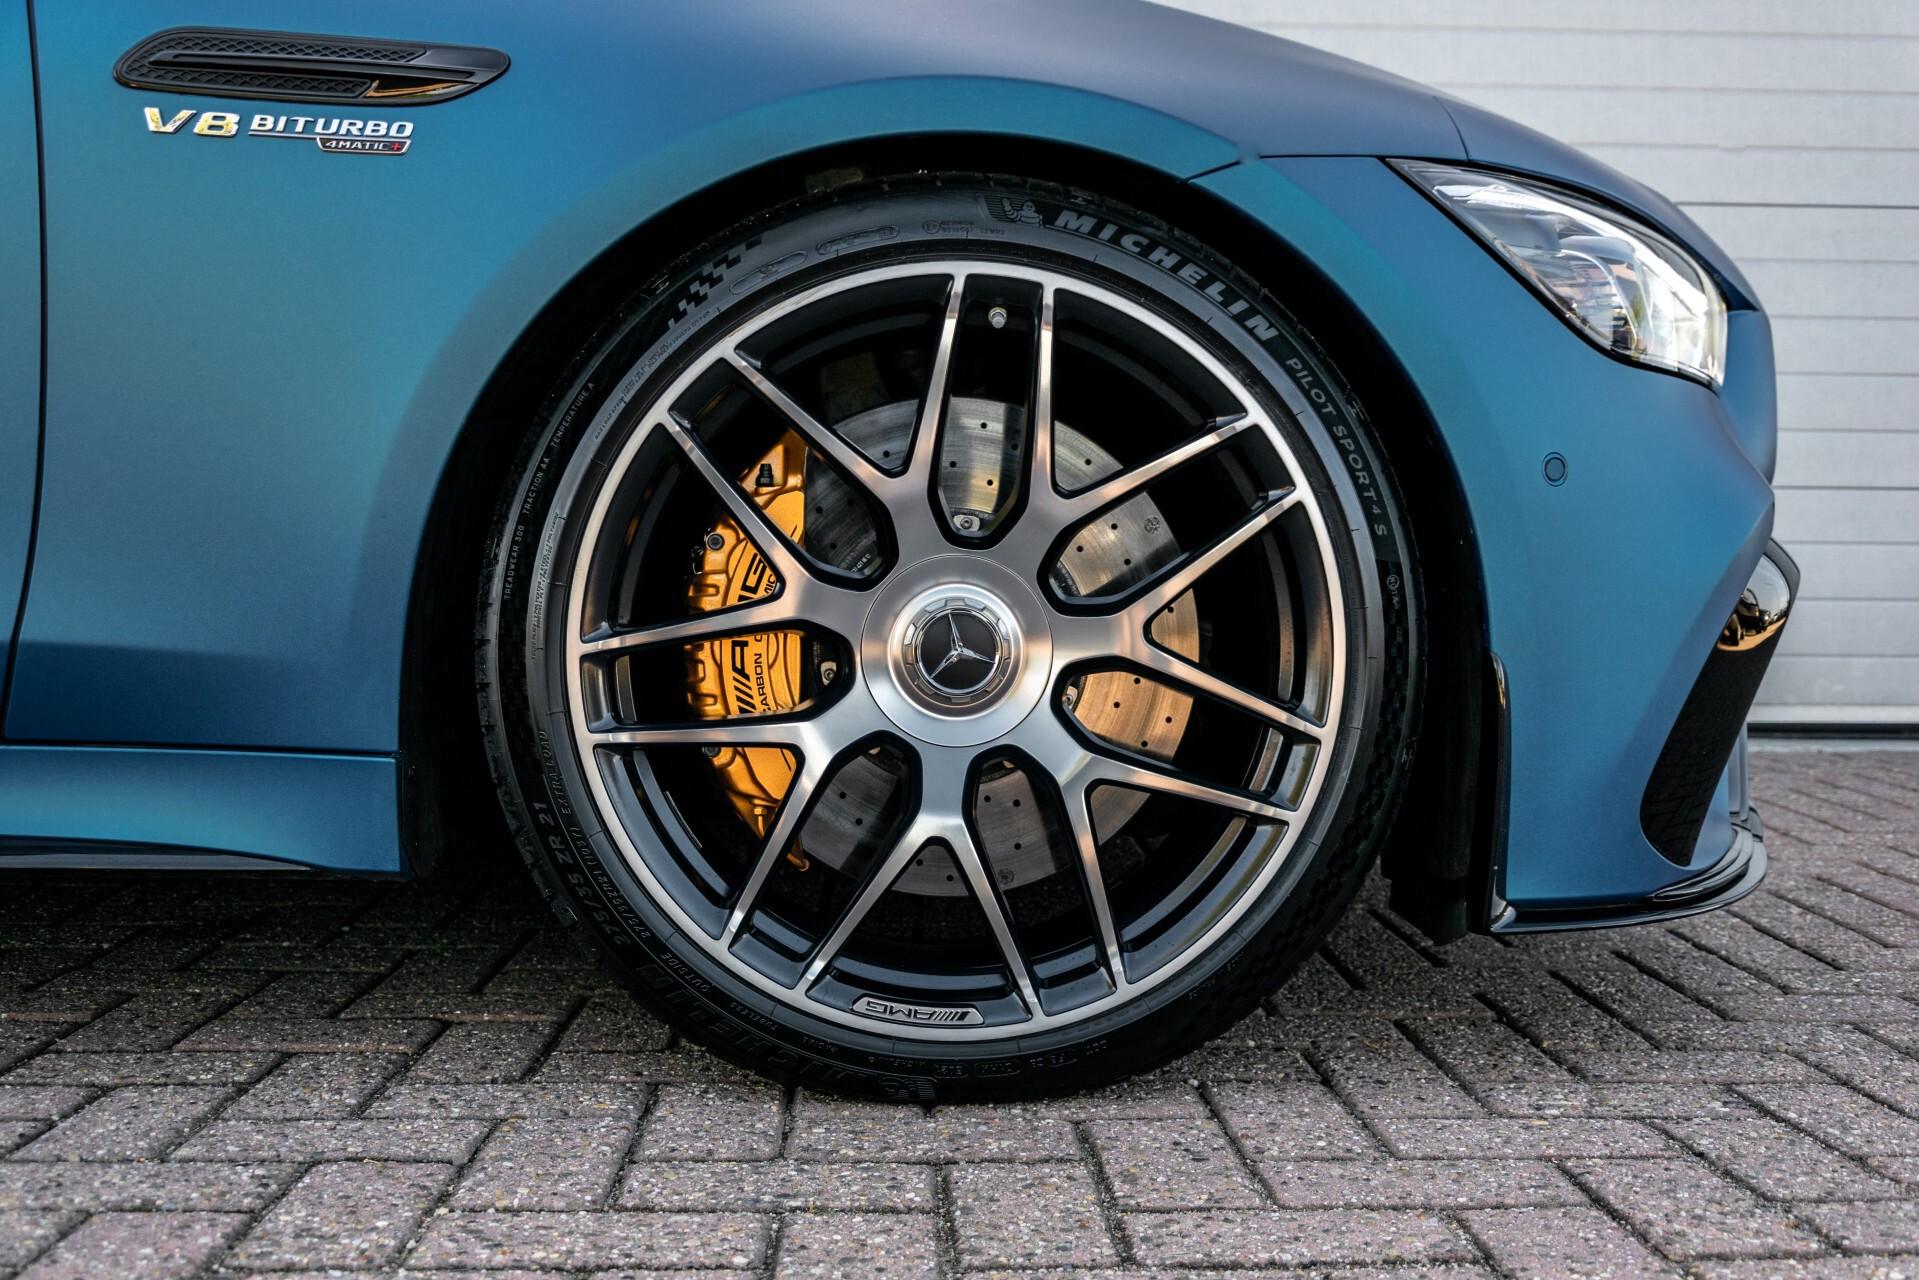 Mercedes-Benz AMG GT 4-Door Coupe 63 S 4MATIC+ Edition 1 Keramisch/Carbon/First Class/Dynamic Plus/Burmester High End 3D Aut9 Foto 82